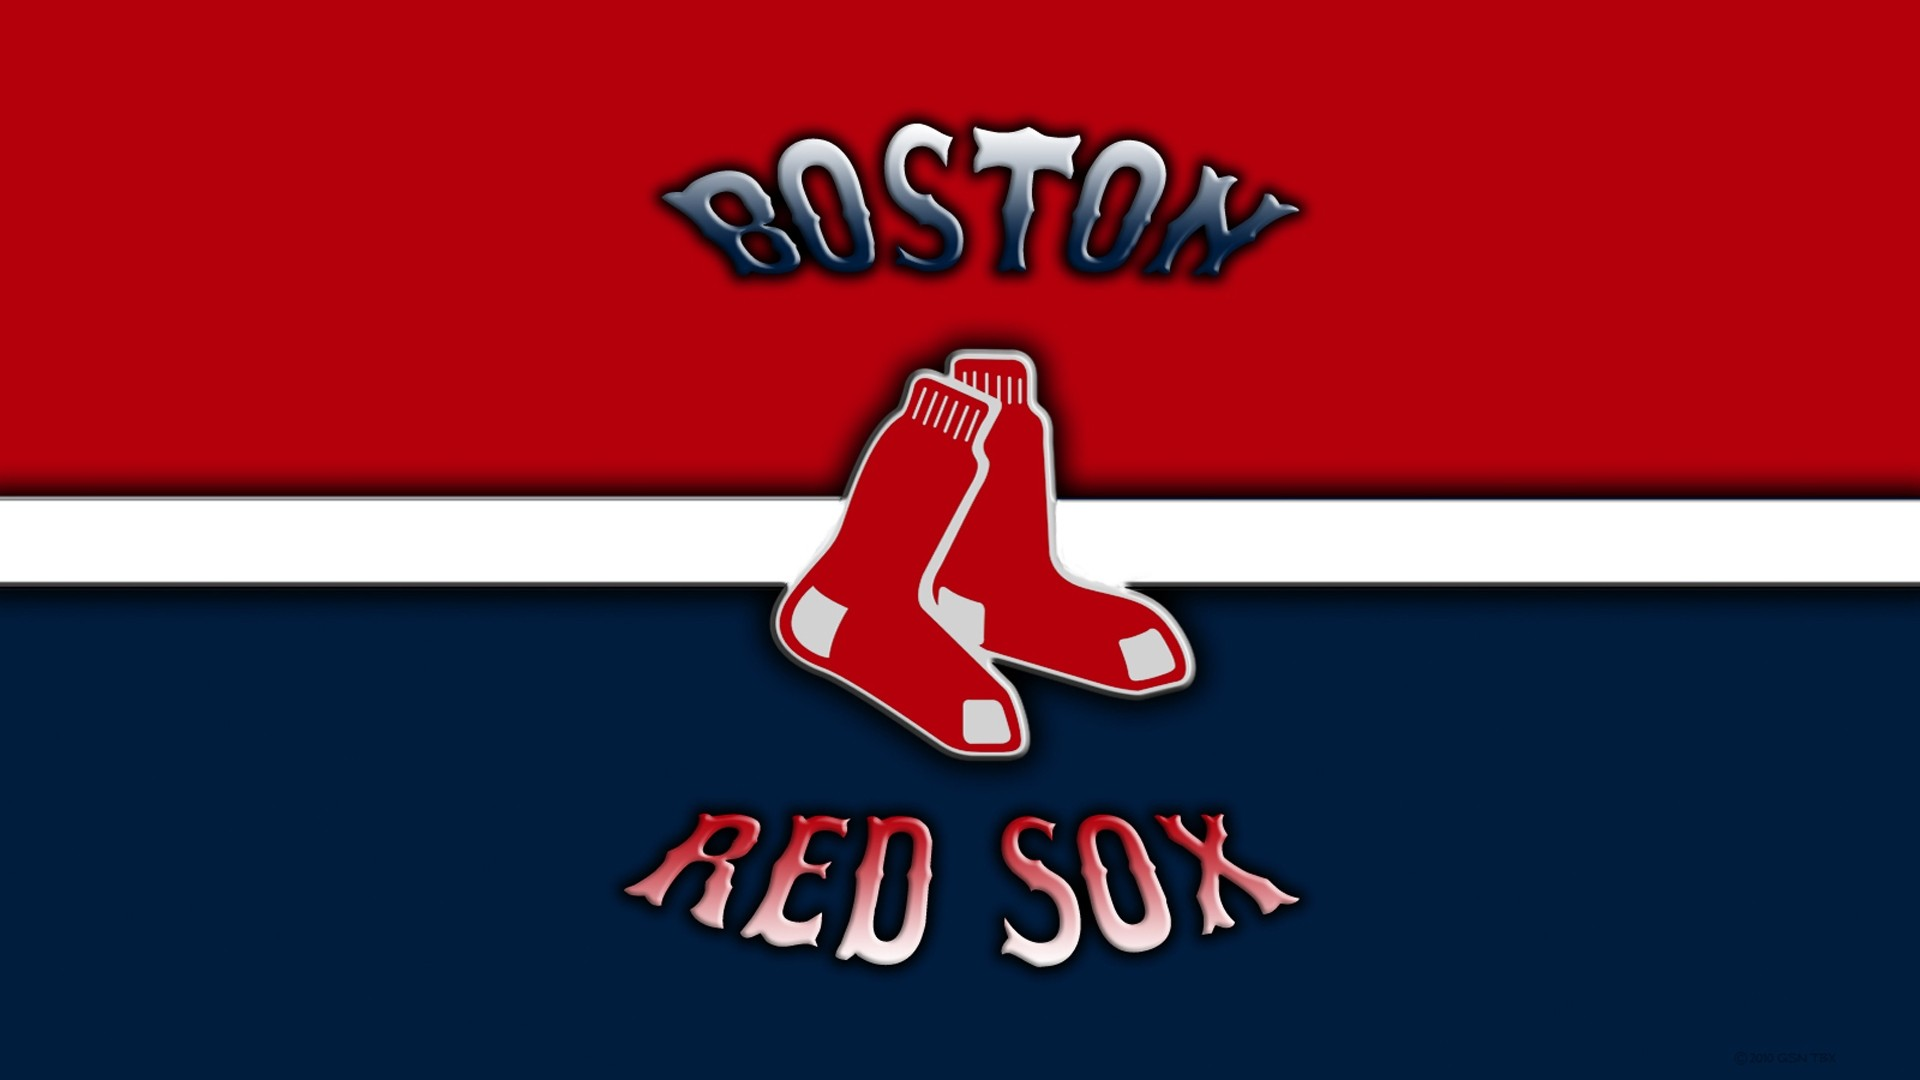 Red Sox wallpaper photo hd